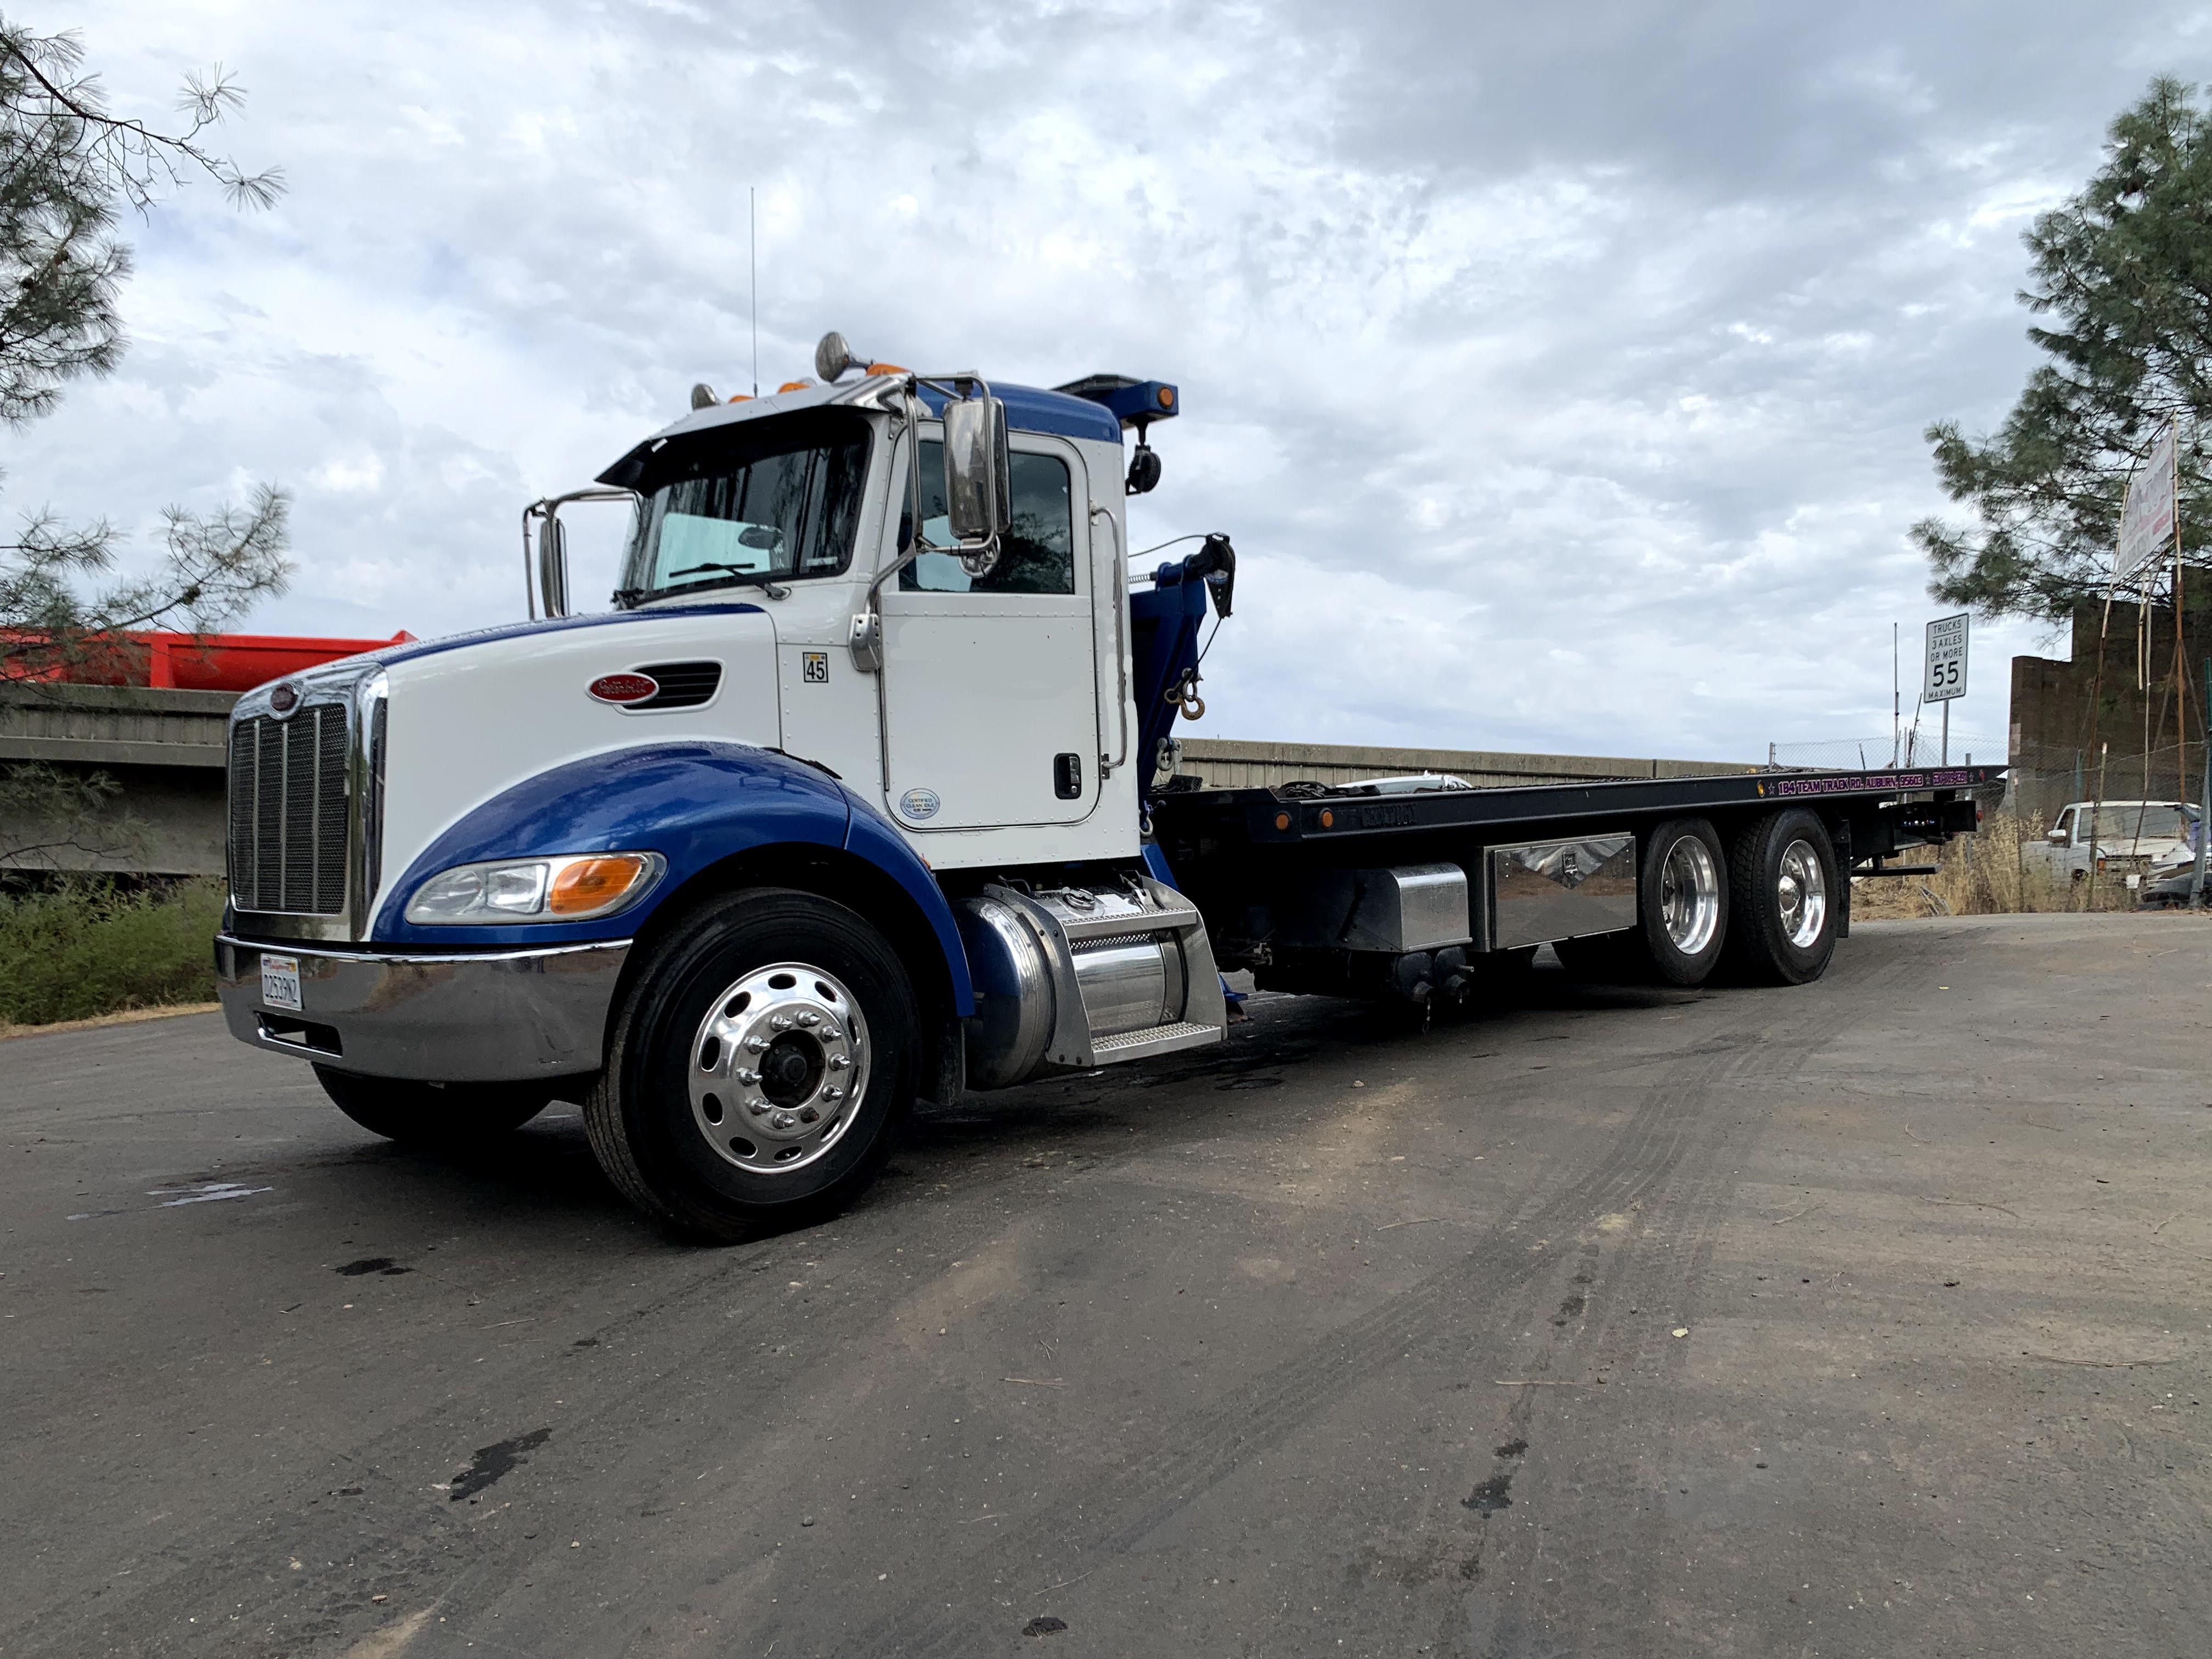 Used, 2015, Peterbilt, 337 / Century 25.0' 16 Series LCG + SP8000, Tow Trucks